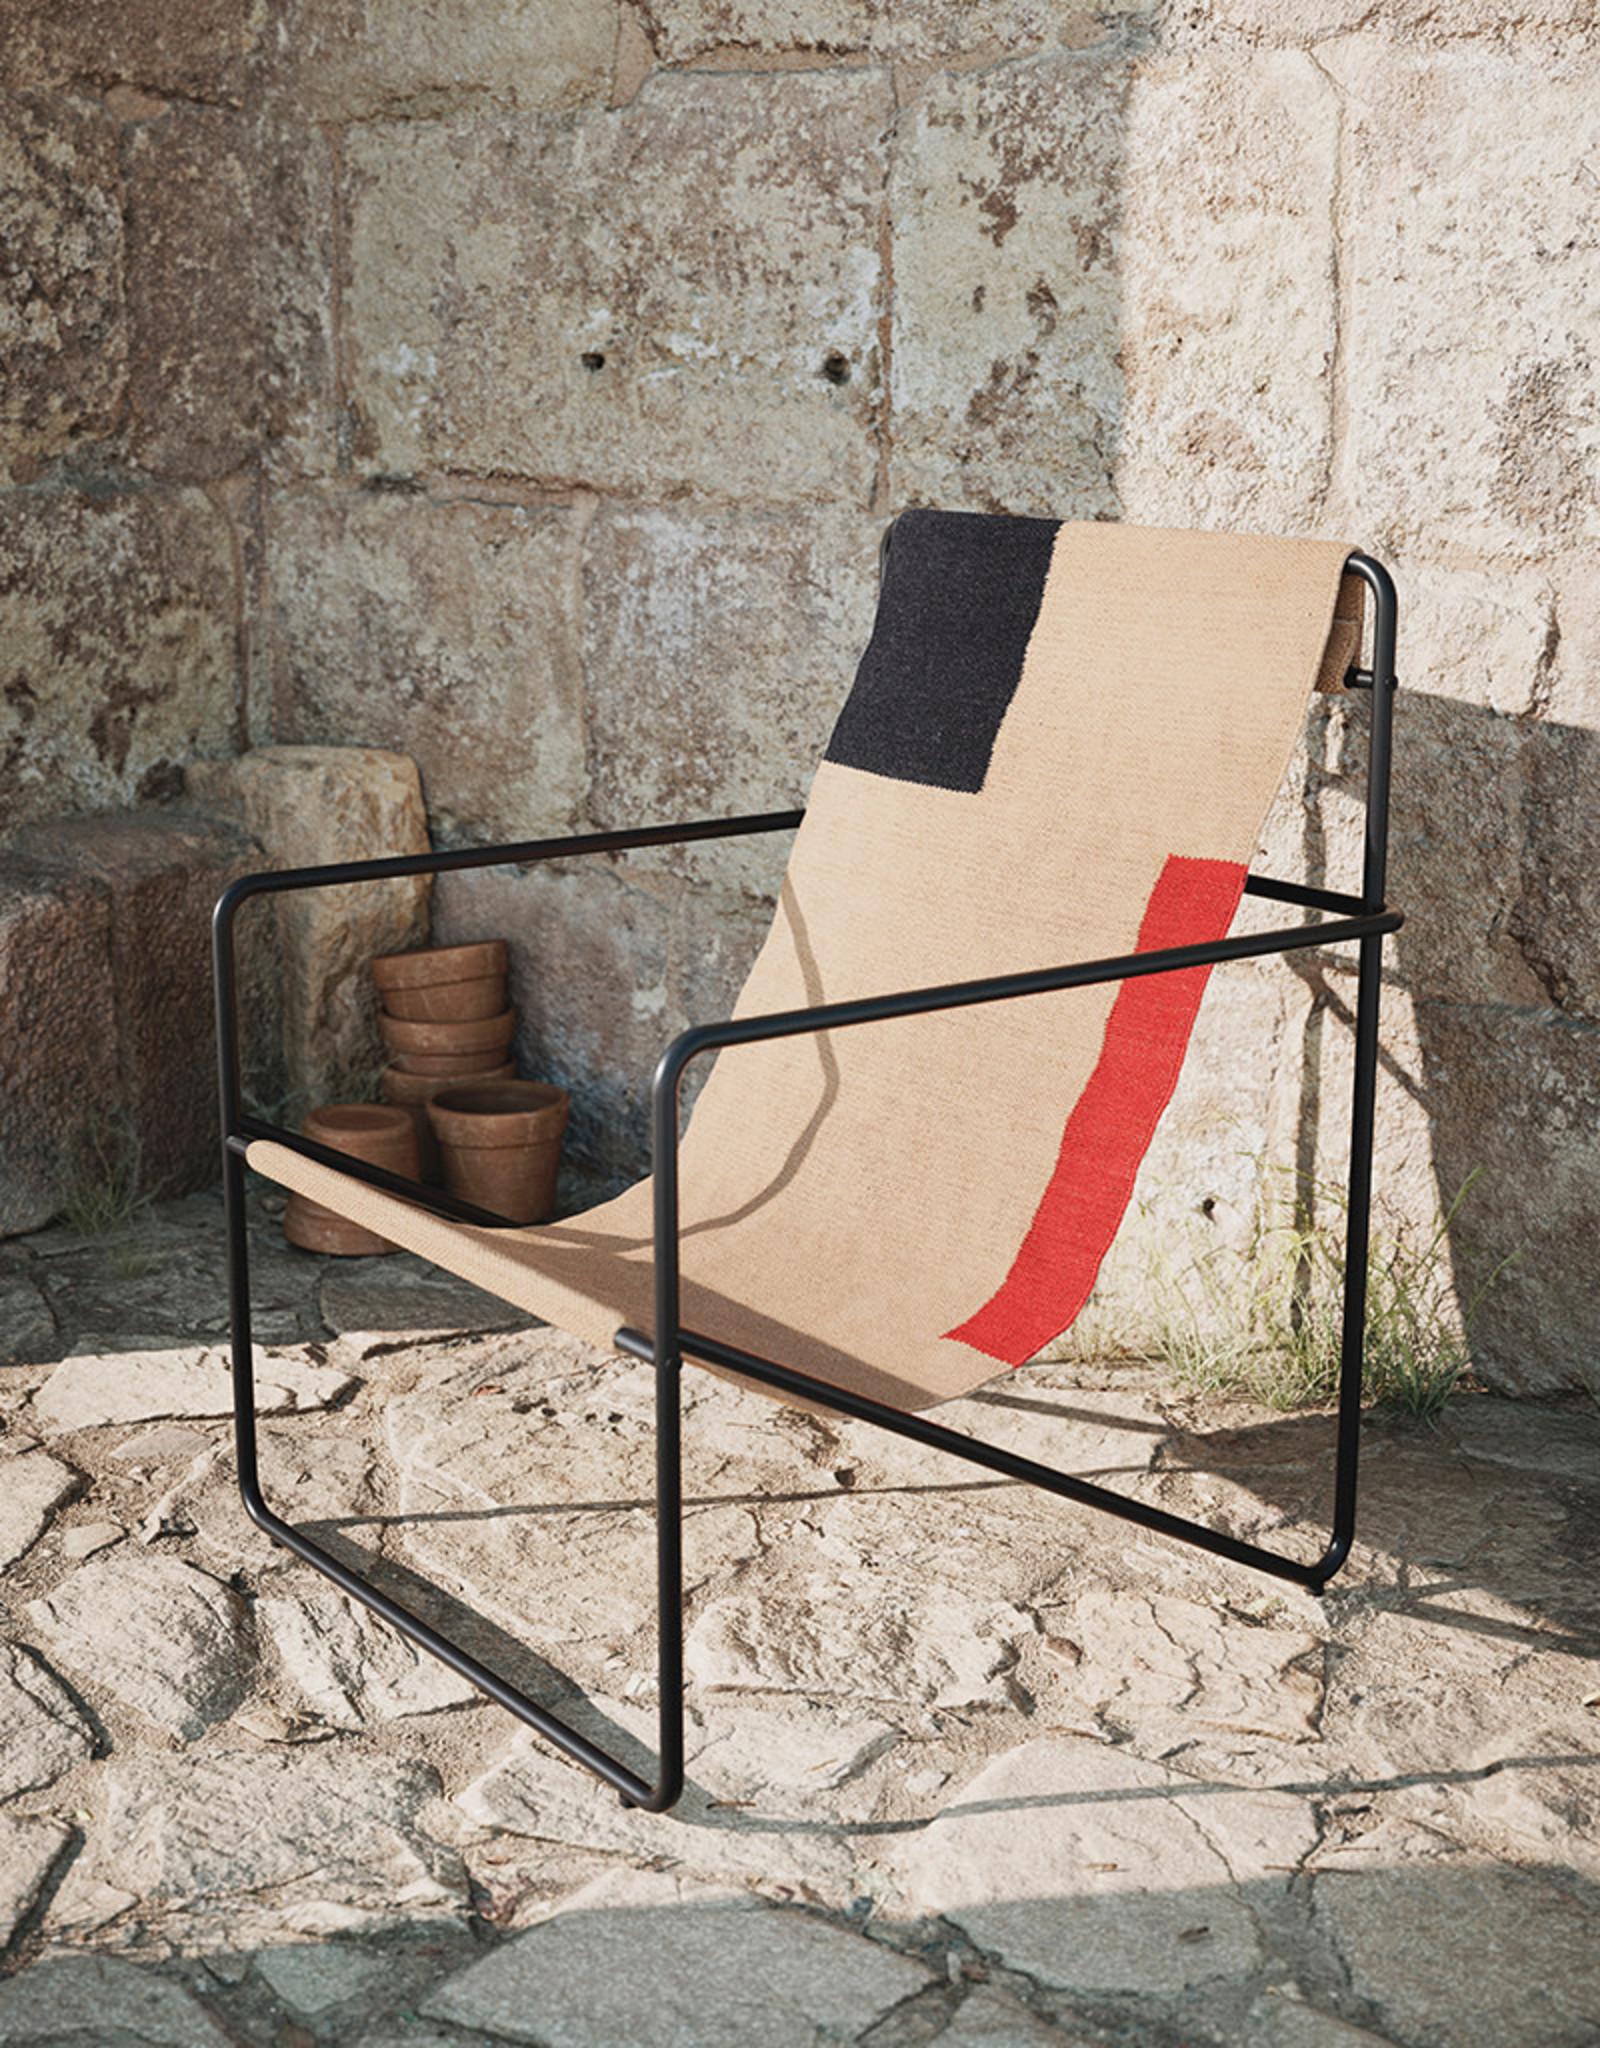 FERM LIVING FERM LIVING Desert Lounge Chair Black/Block